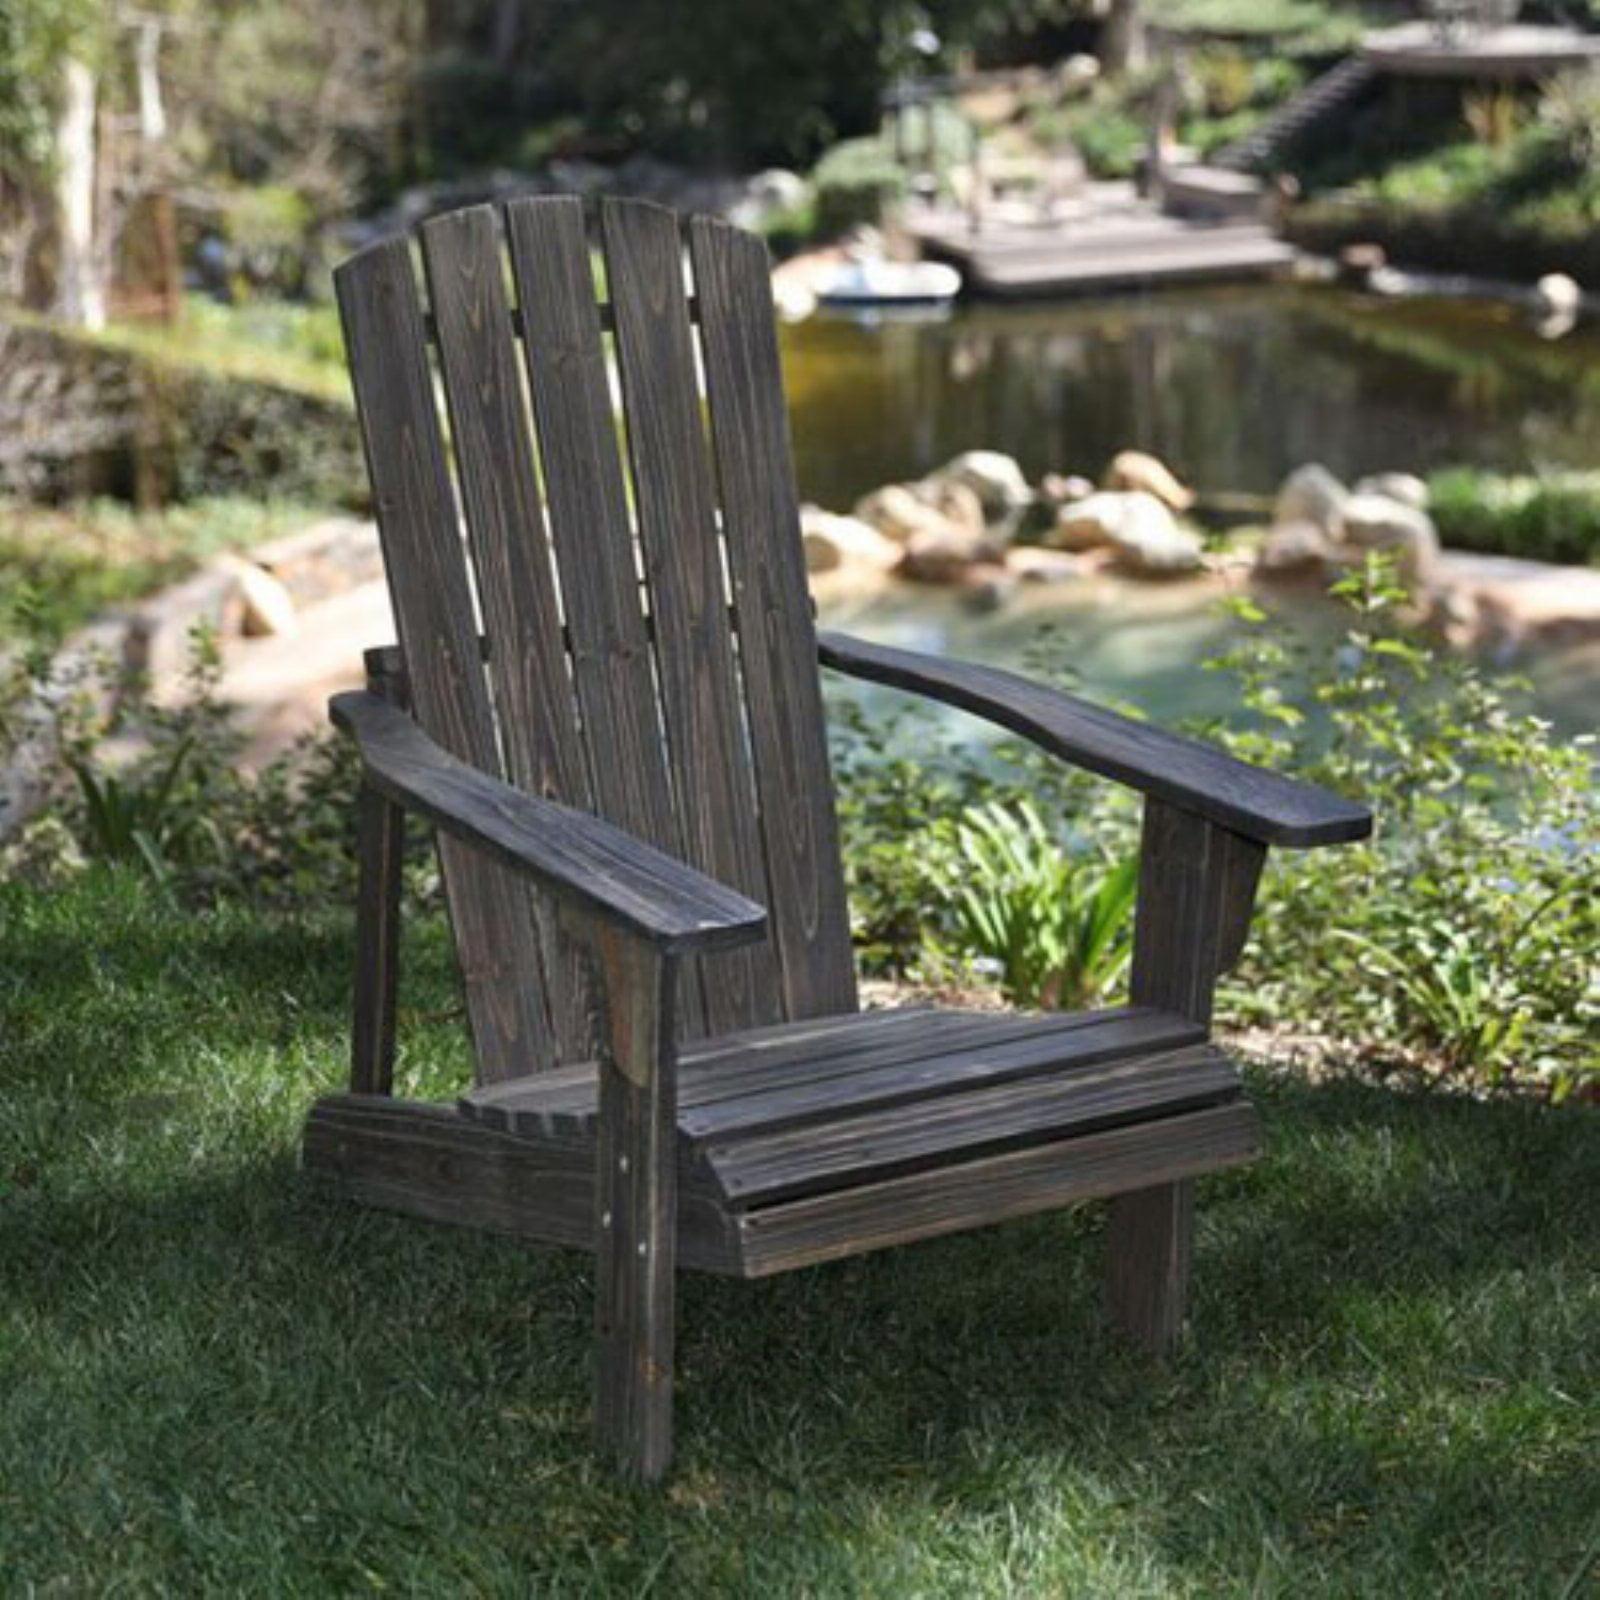 Lakewood Rustic Adirondack Chair Barnwood by Shine Company